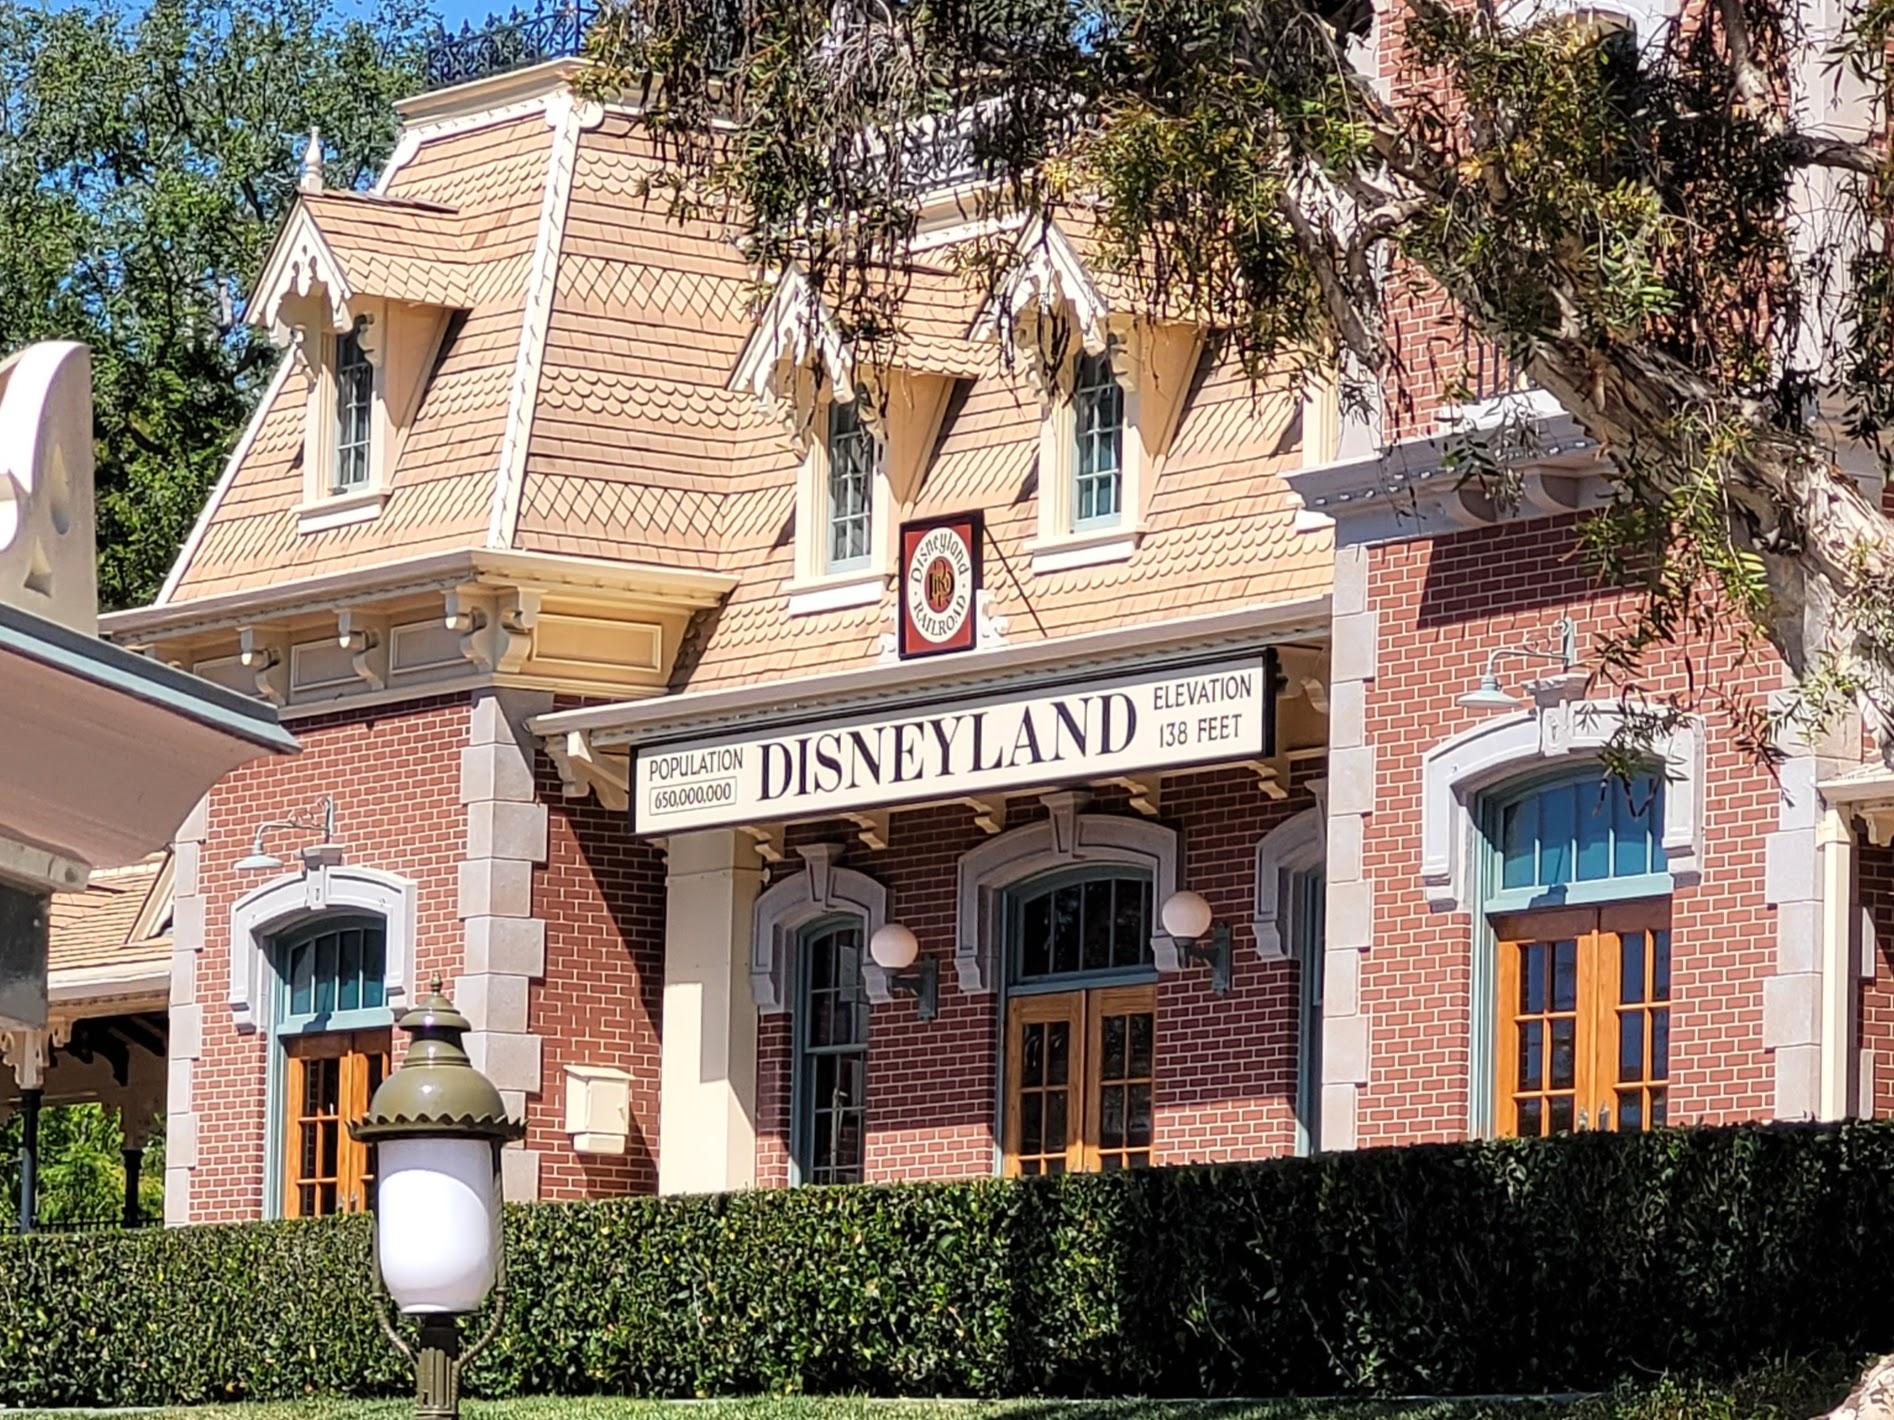 Disneyland Sign at Entrance Near Disneyland Railroad